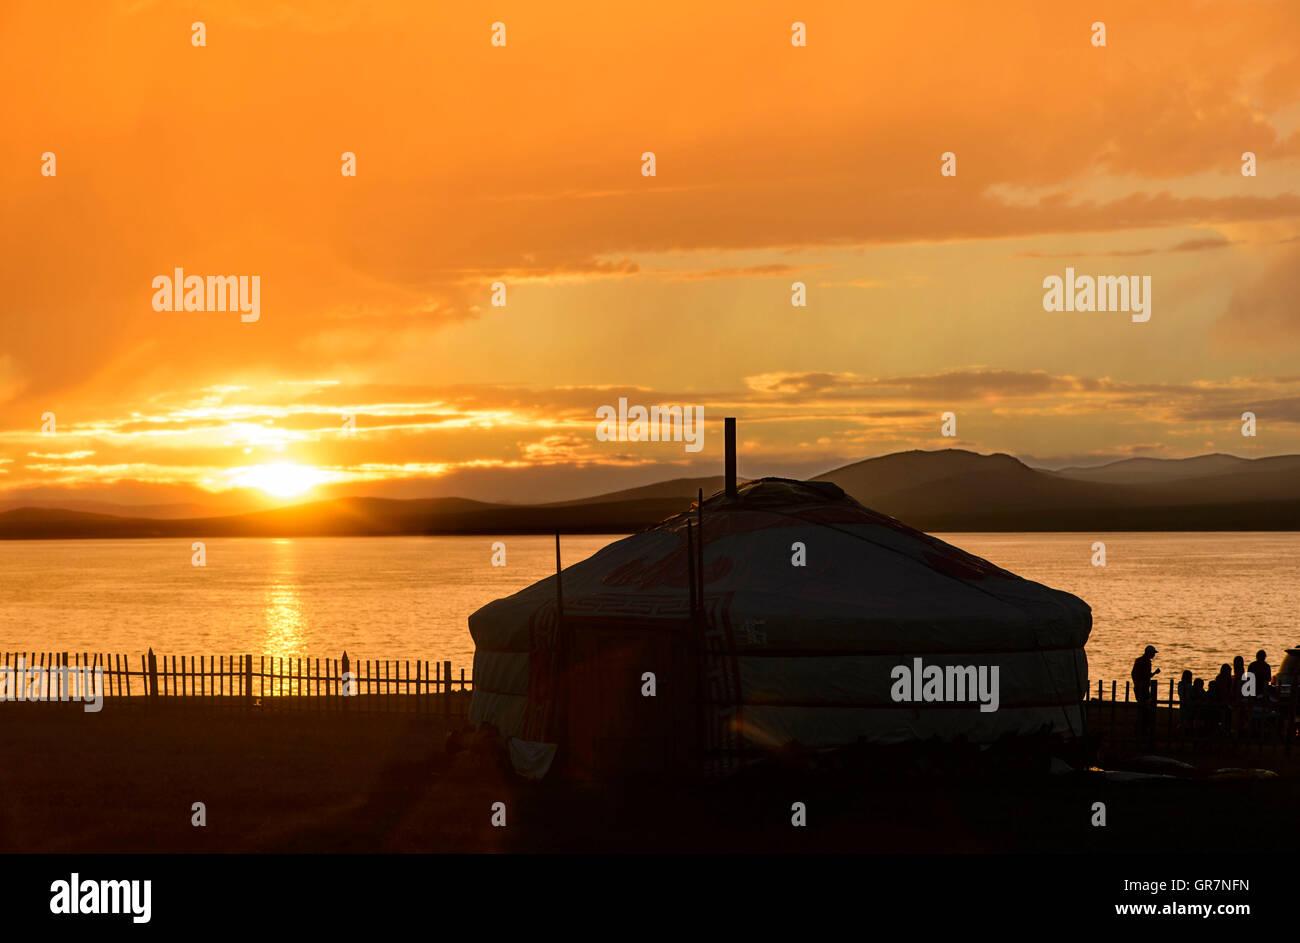 Sunset At Ger Camp Khatan Ugii At Ogii Nuur Lac, Arkhangai Aimag, Mongolia - Stock Image